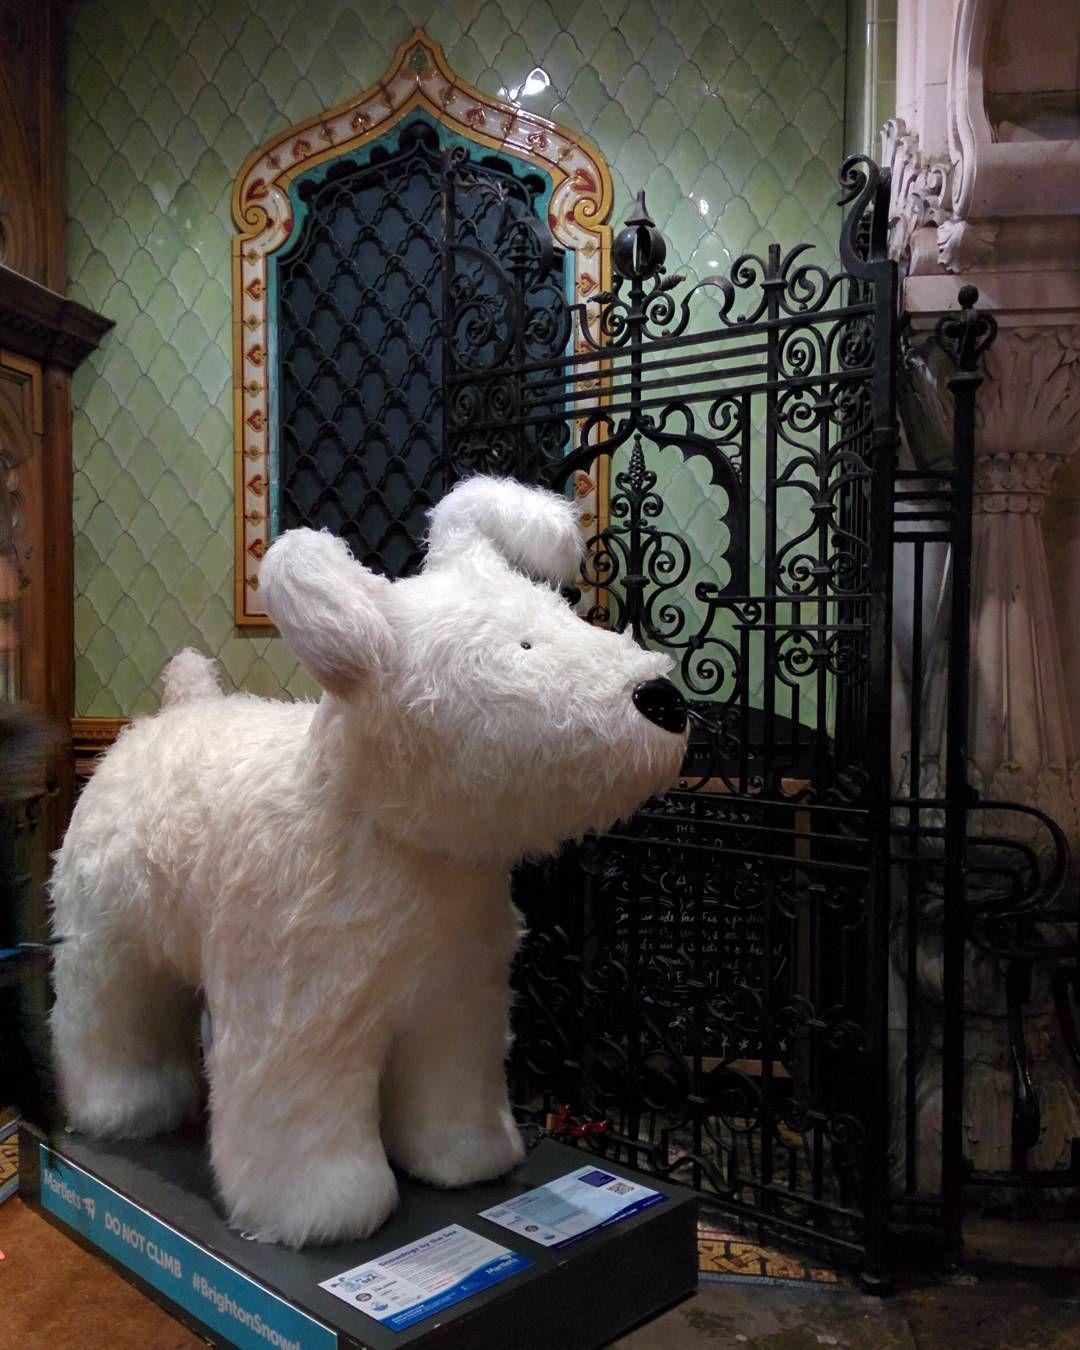 Very cute #snowdog #Brighton #BrightonDome #brighton_ig